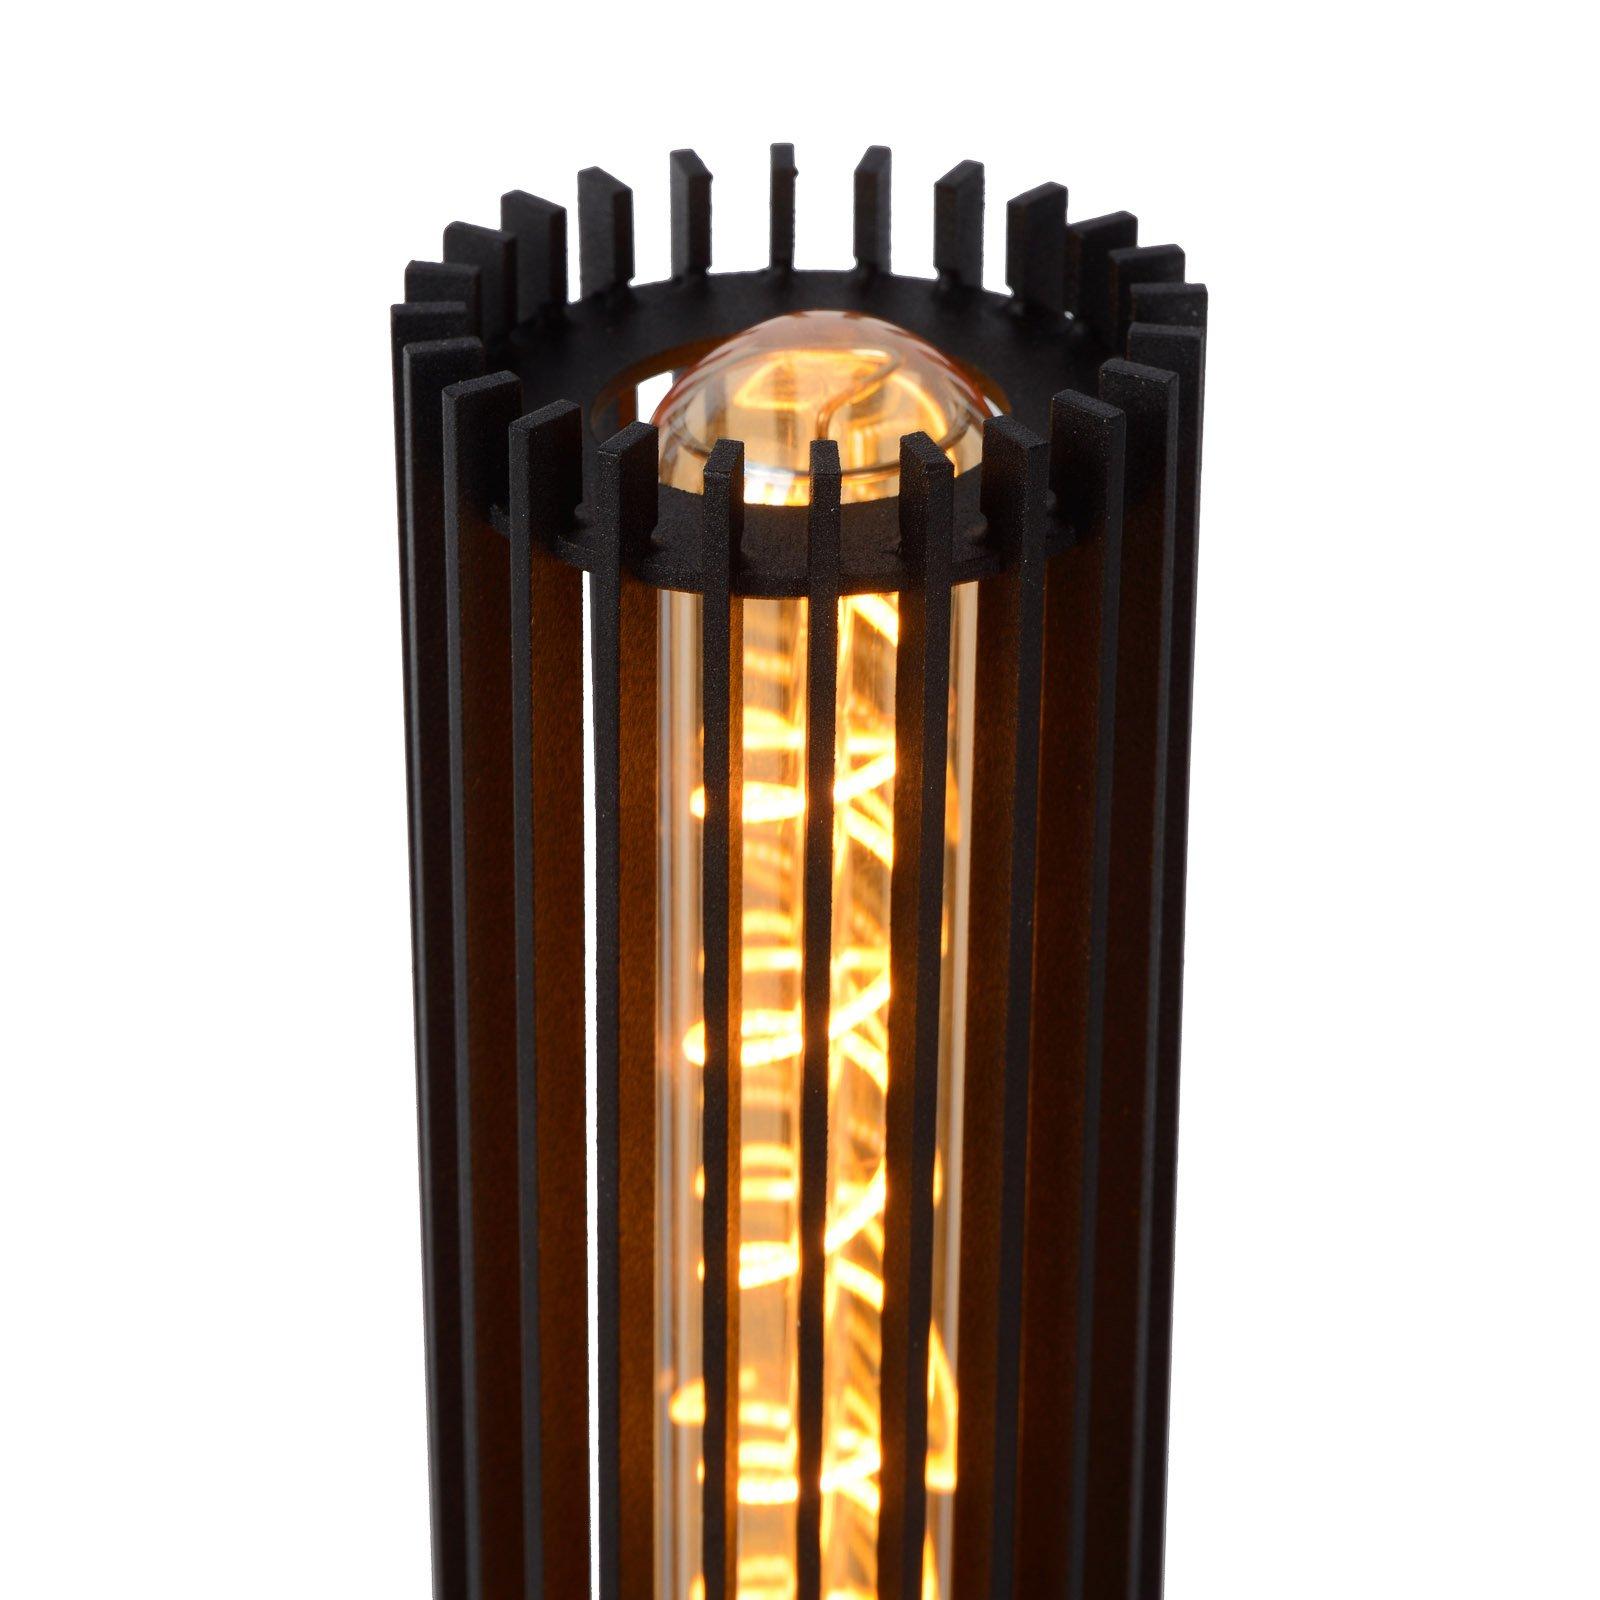 Lionel bordlampe av metall i svart